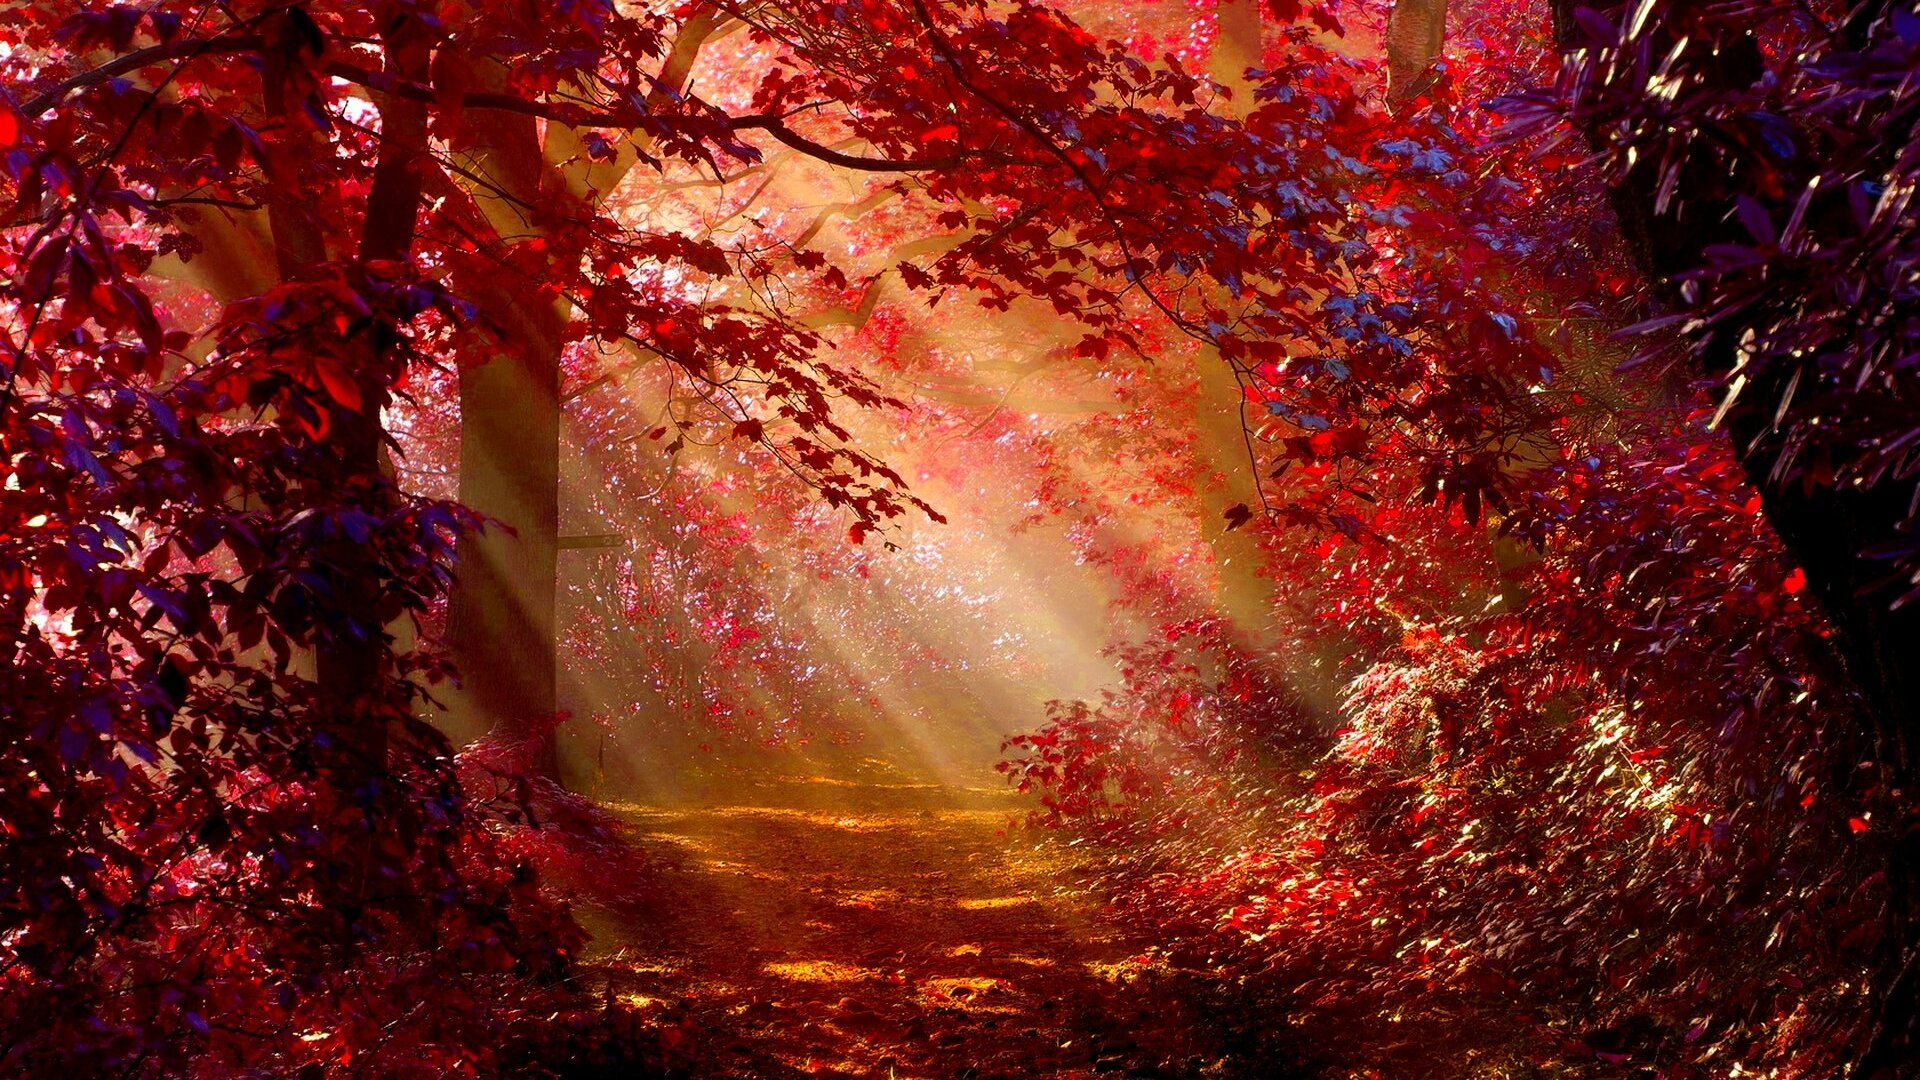 1920x1080 Sunlight In Autumn Forest Laptop Full HD 1080P ...